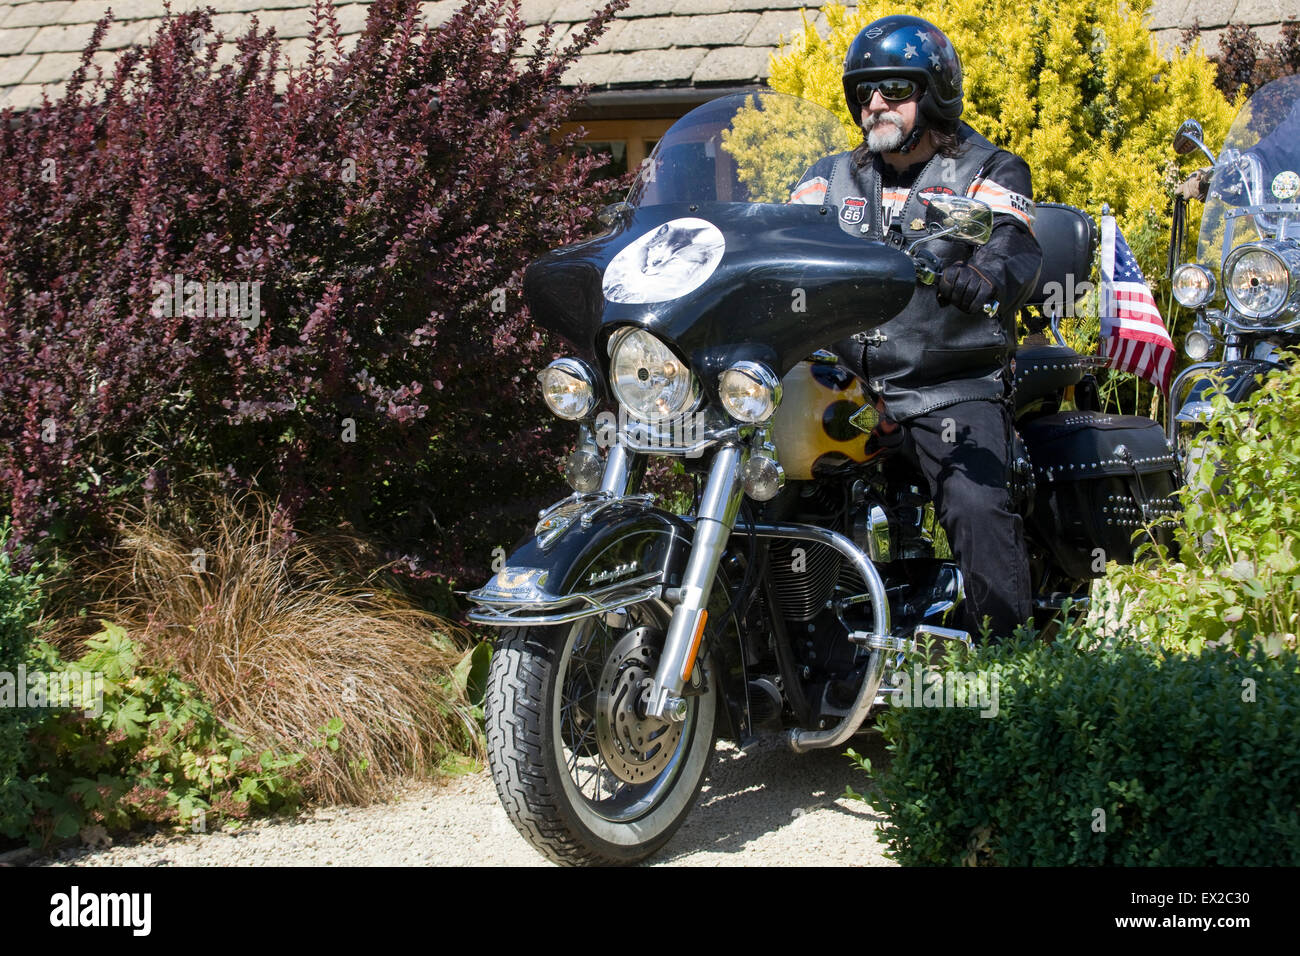 Biker on his Harley Davidson motorcycle - Stock Image